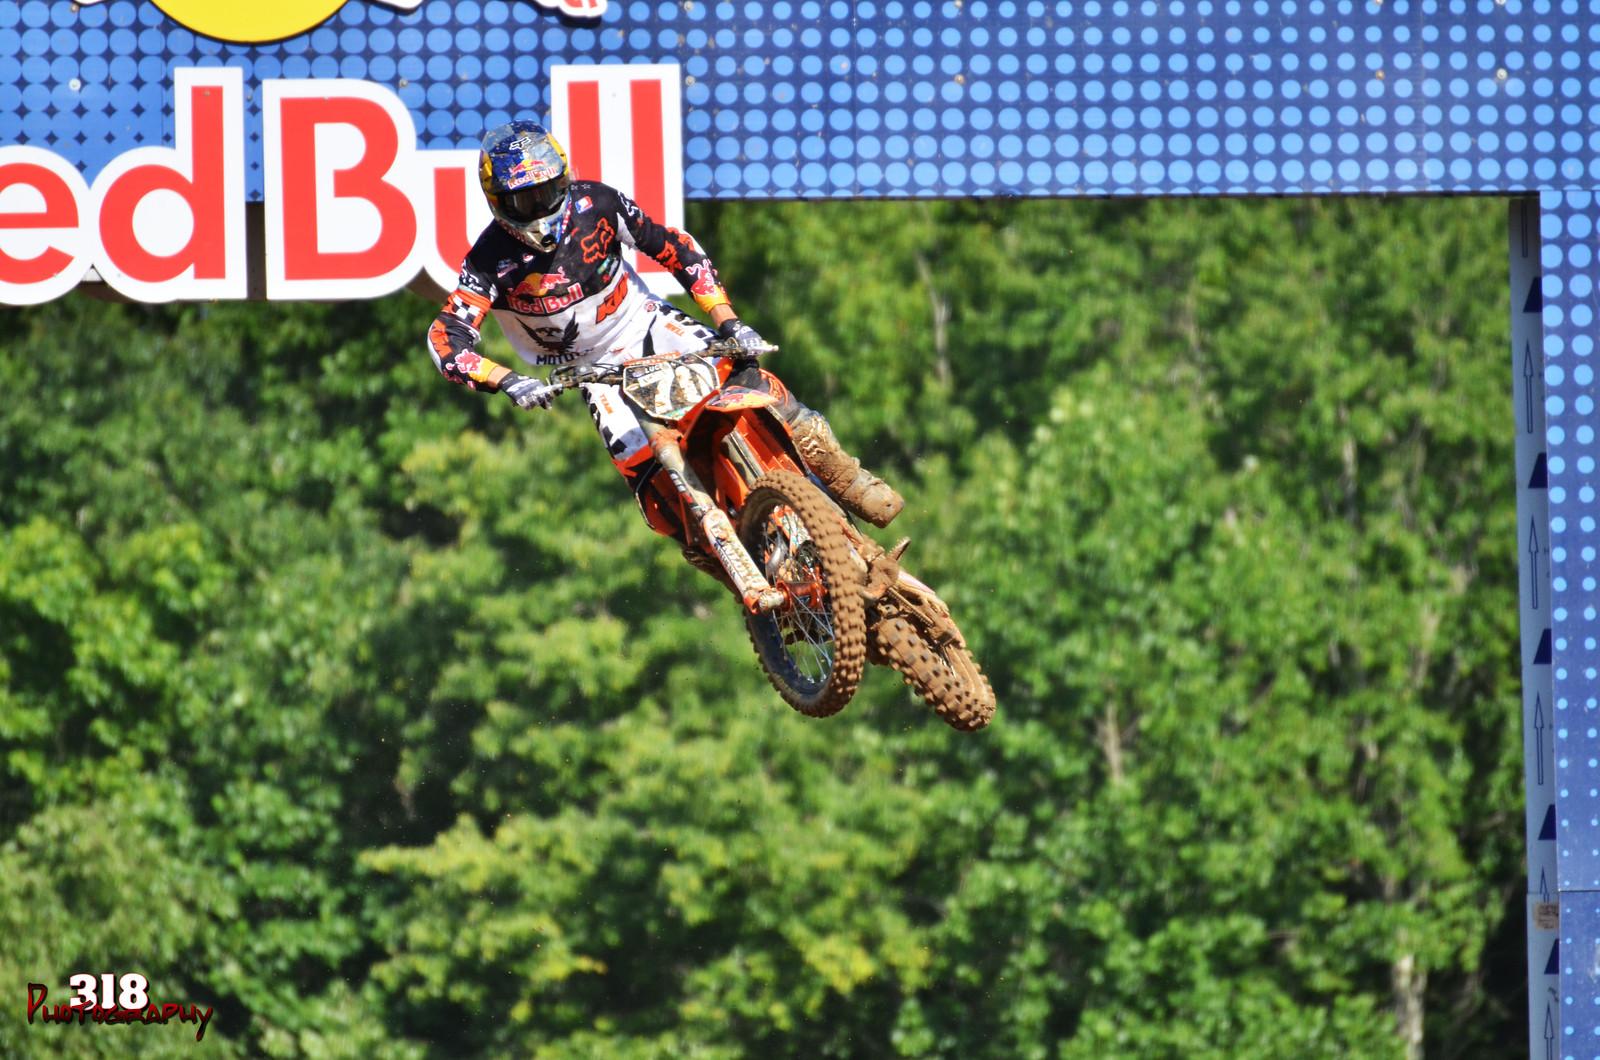 70-02 - MxPro318 - Motocross Pictures - Vital MX